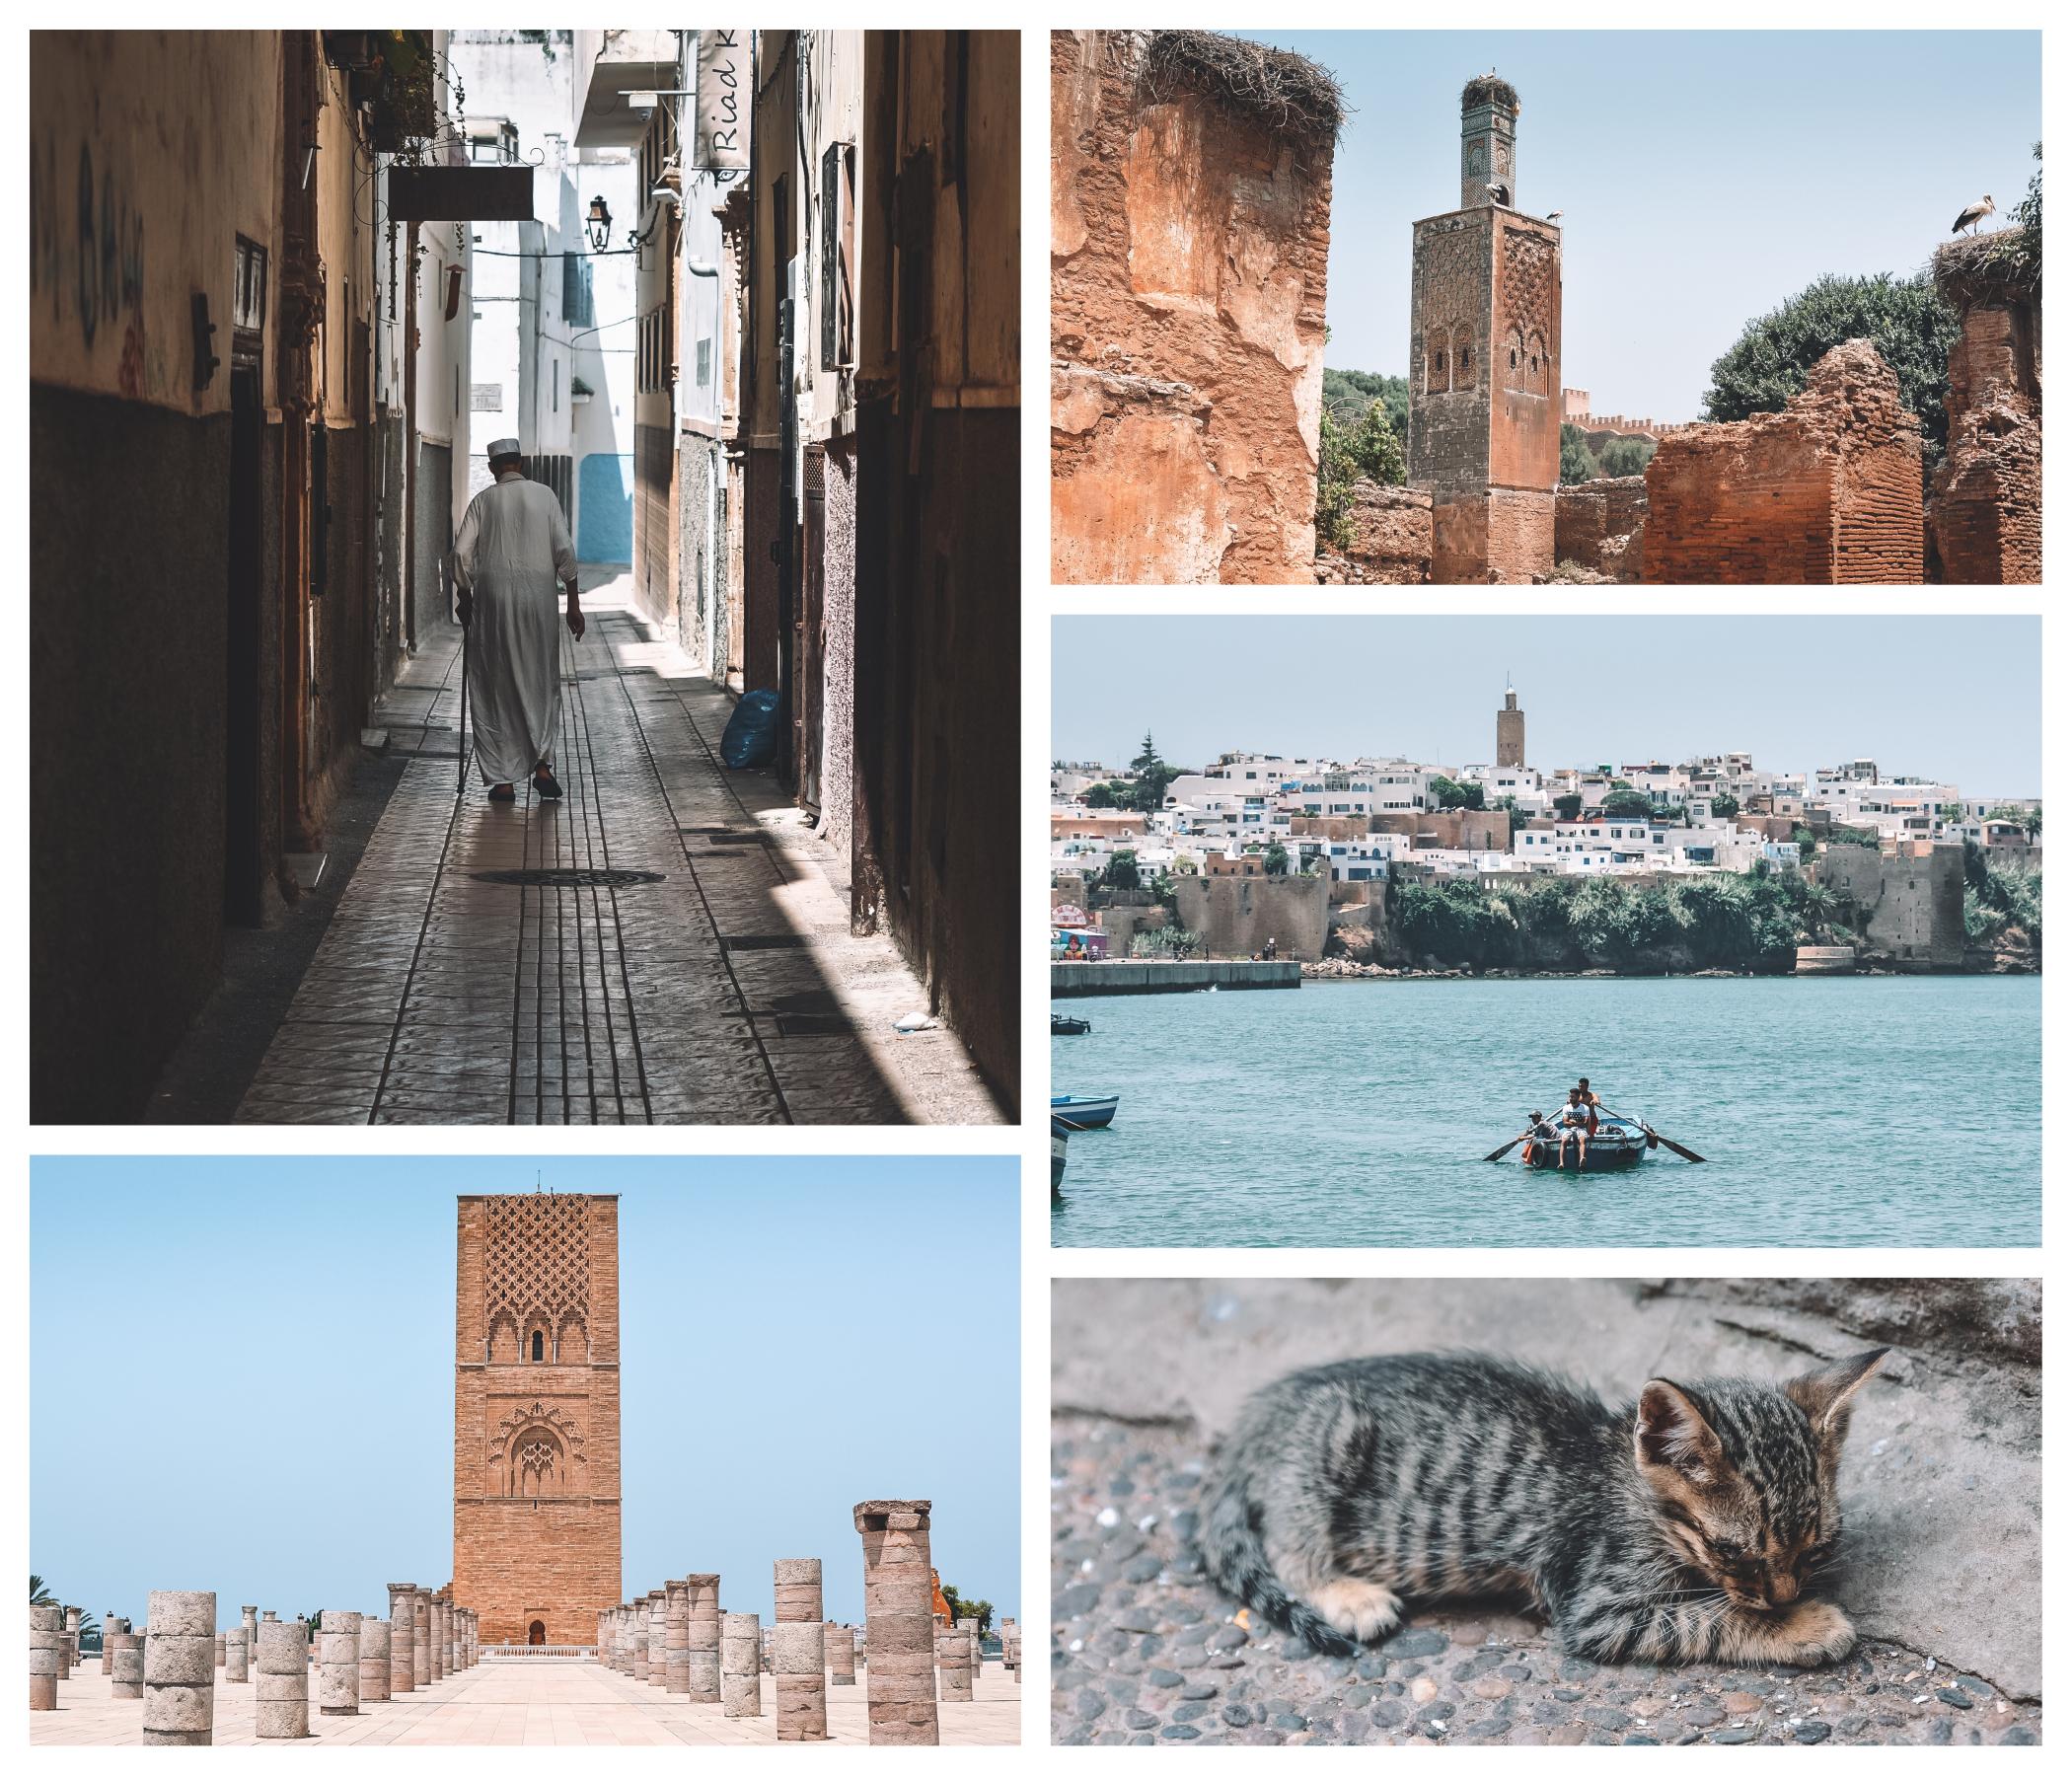 maroc rabat voyage